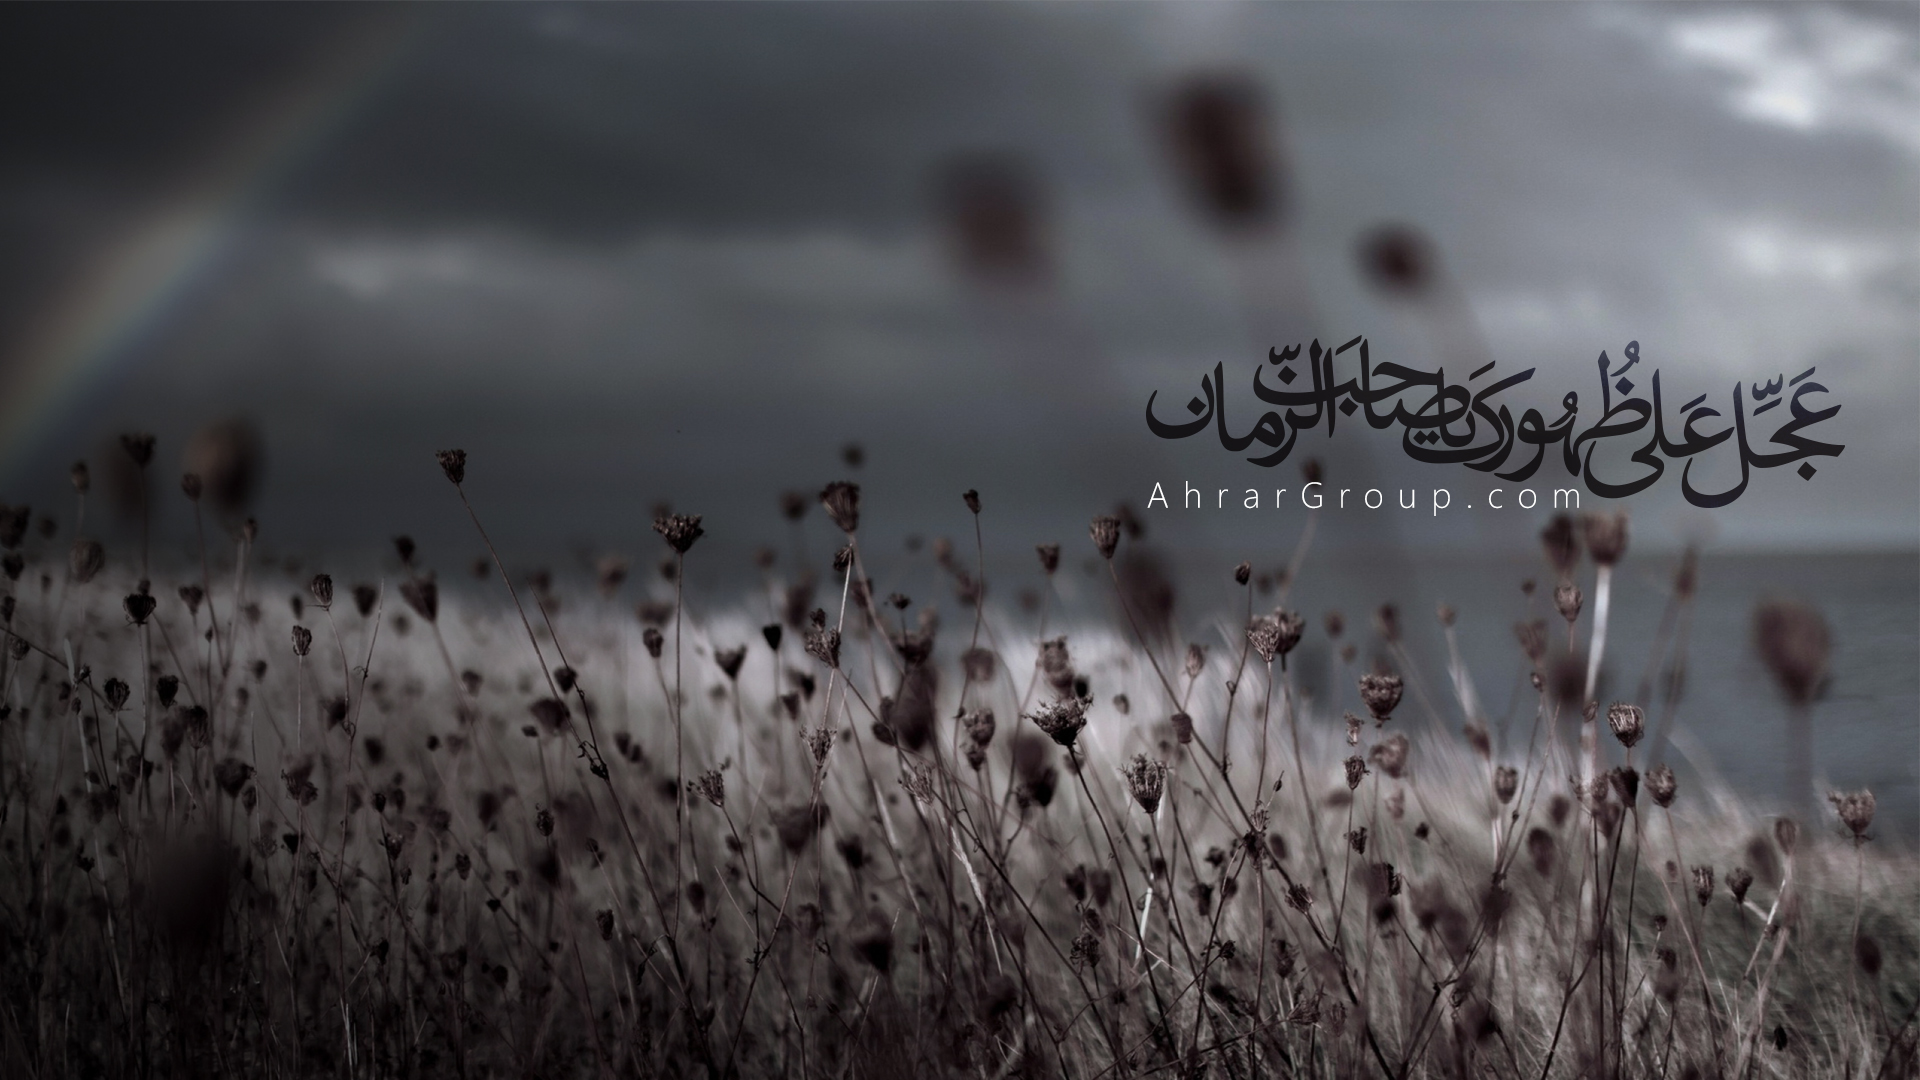 ahrargroup-793